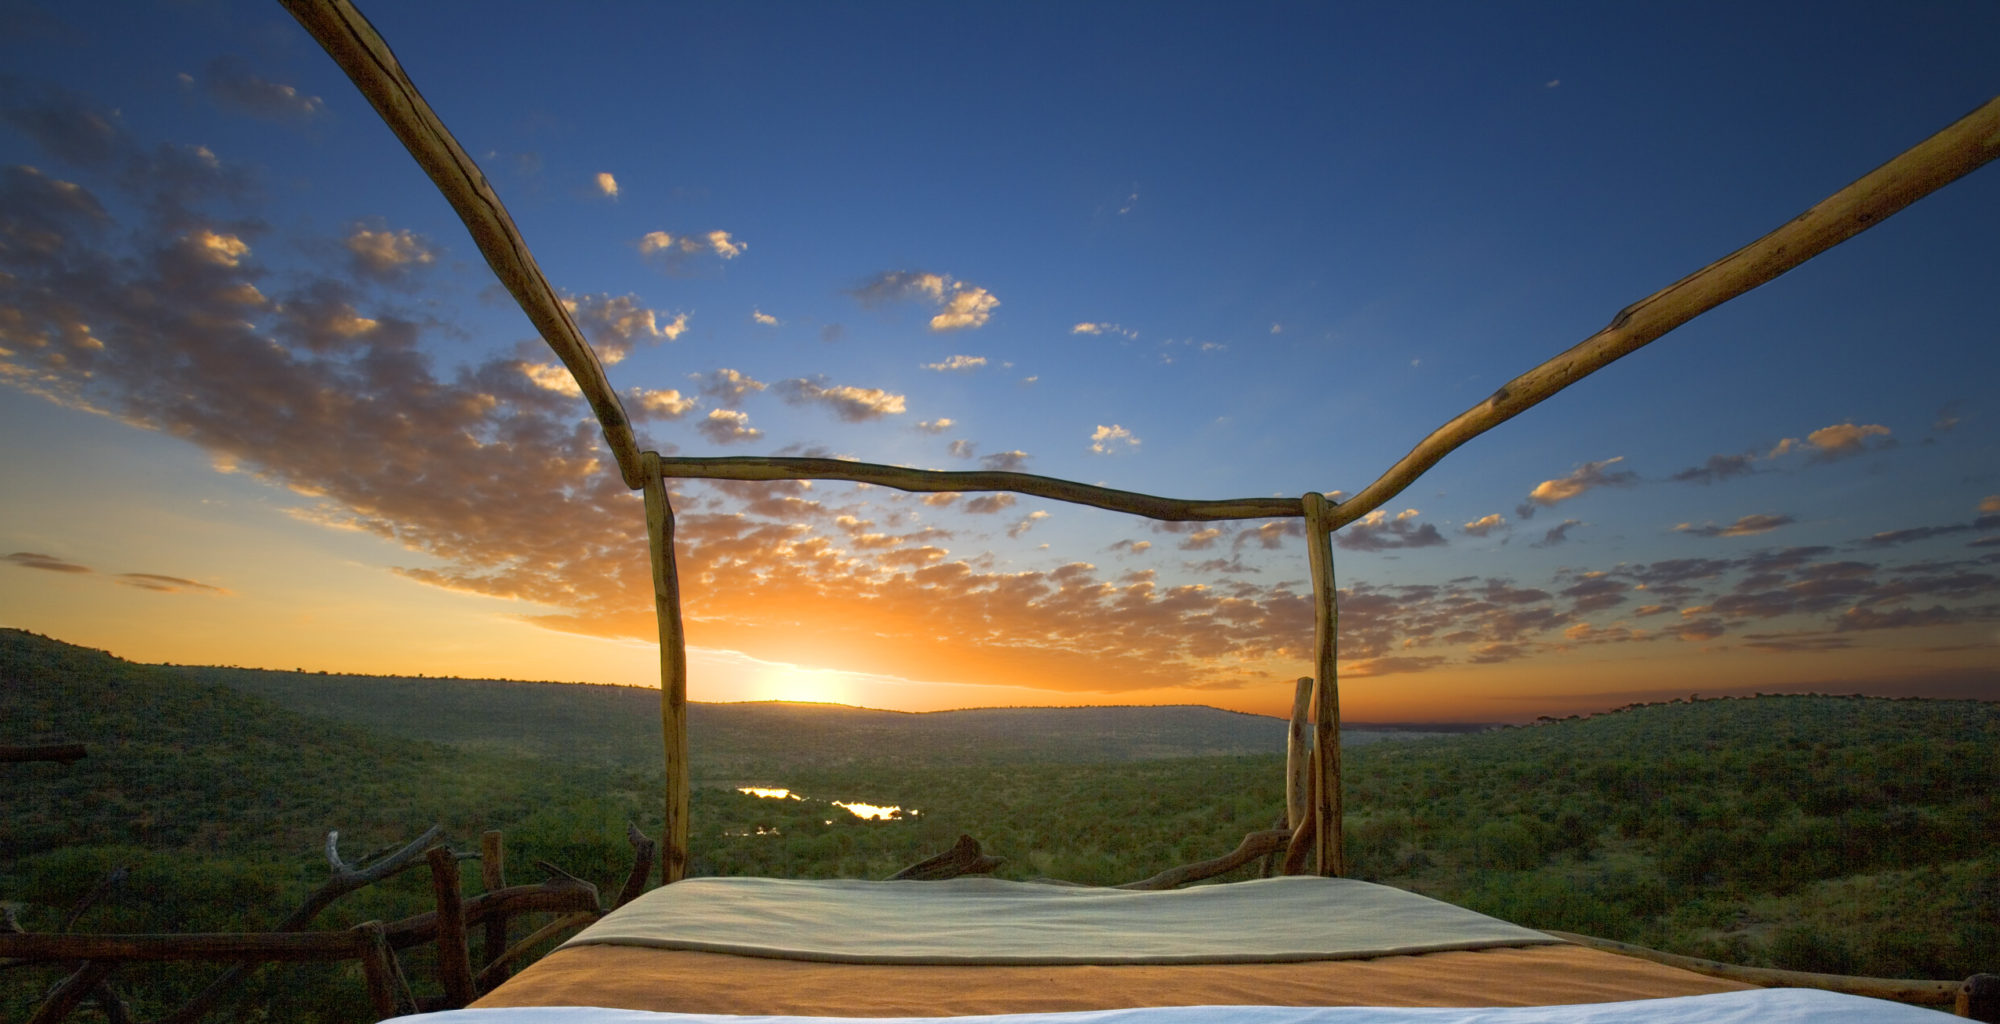 Loisaba Starbeds Kenya Bed View